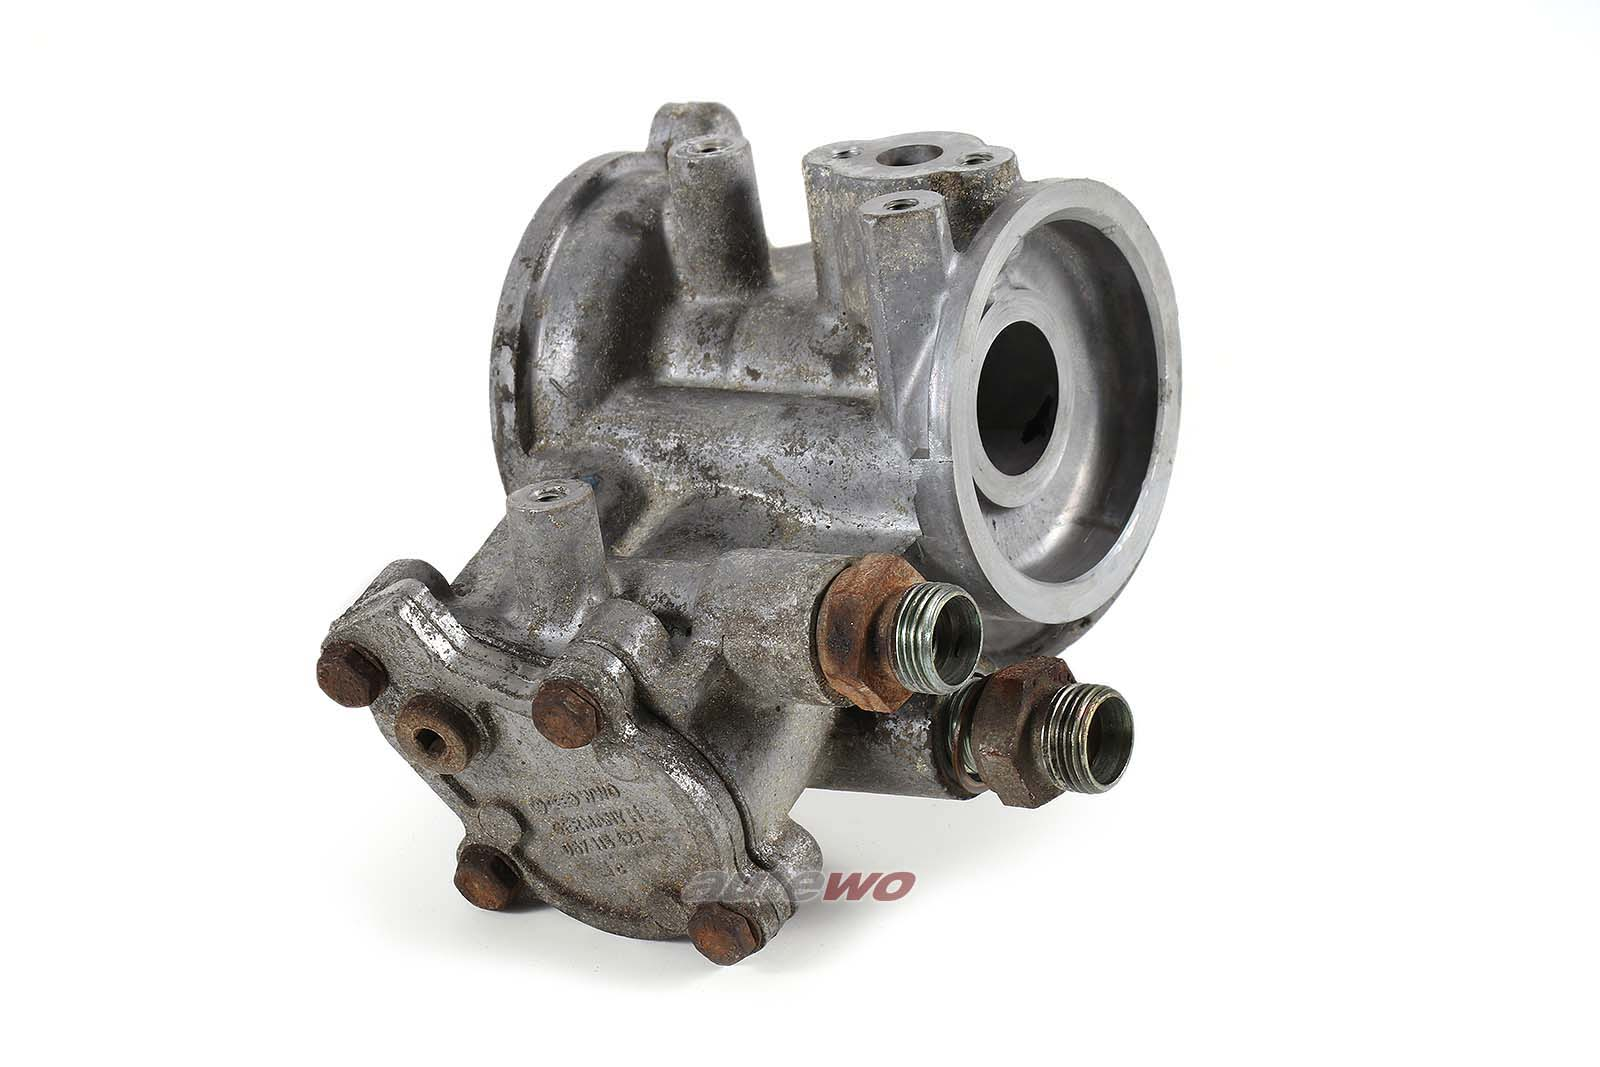 035115417B Audi Urquattro/100/200 Typ 43/44 10V Turbo Ölfilterhalter